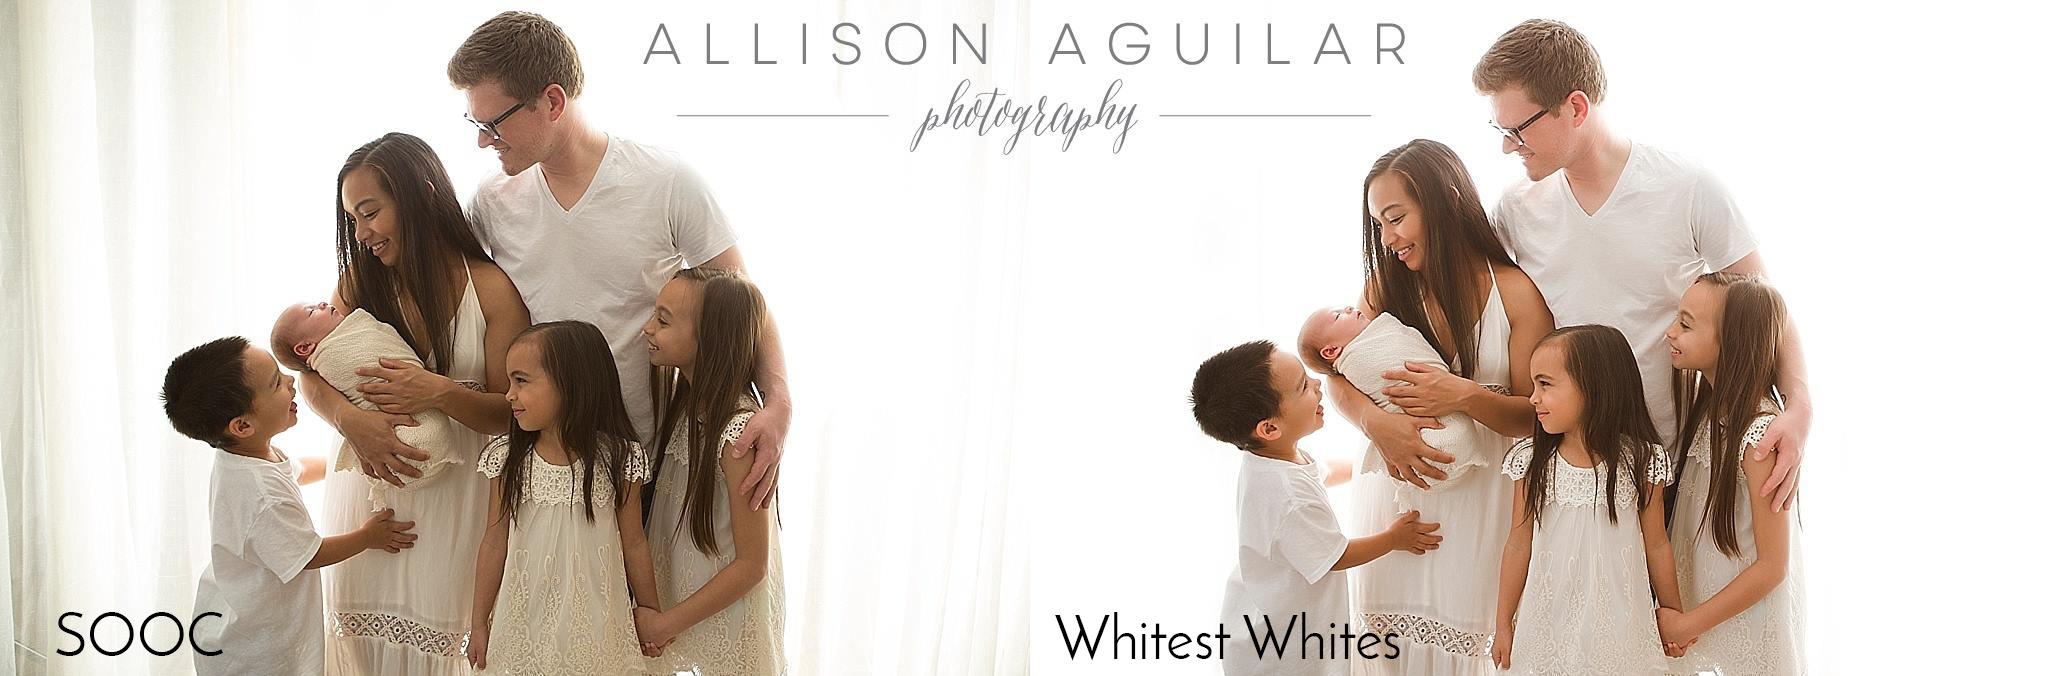 Allison Aguilar Photography